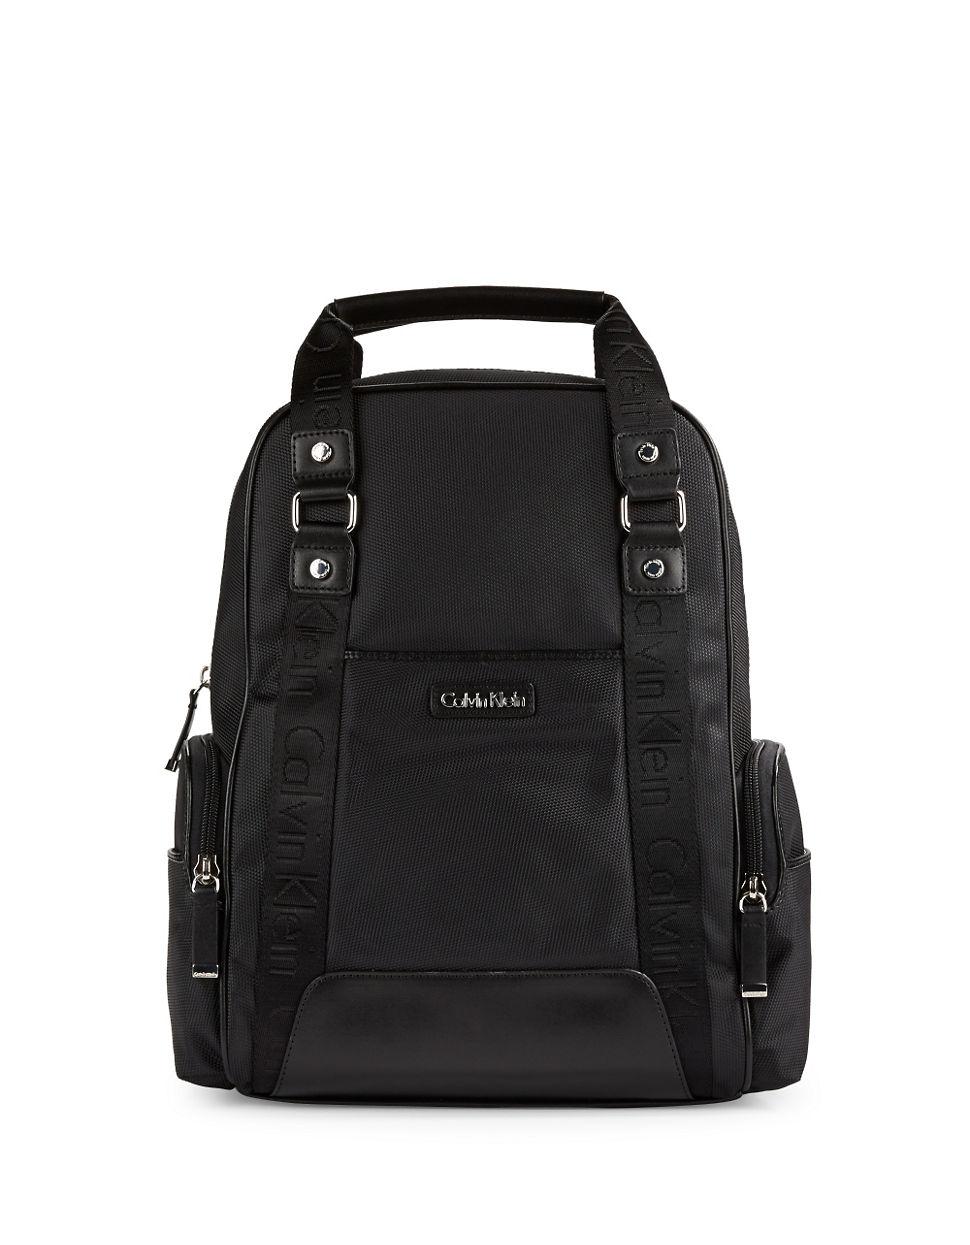 38db85361aa Calvin Klein Talia Dressy Nylon Backpack Black | Building Materials ...